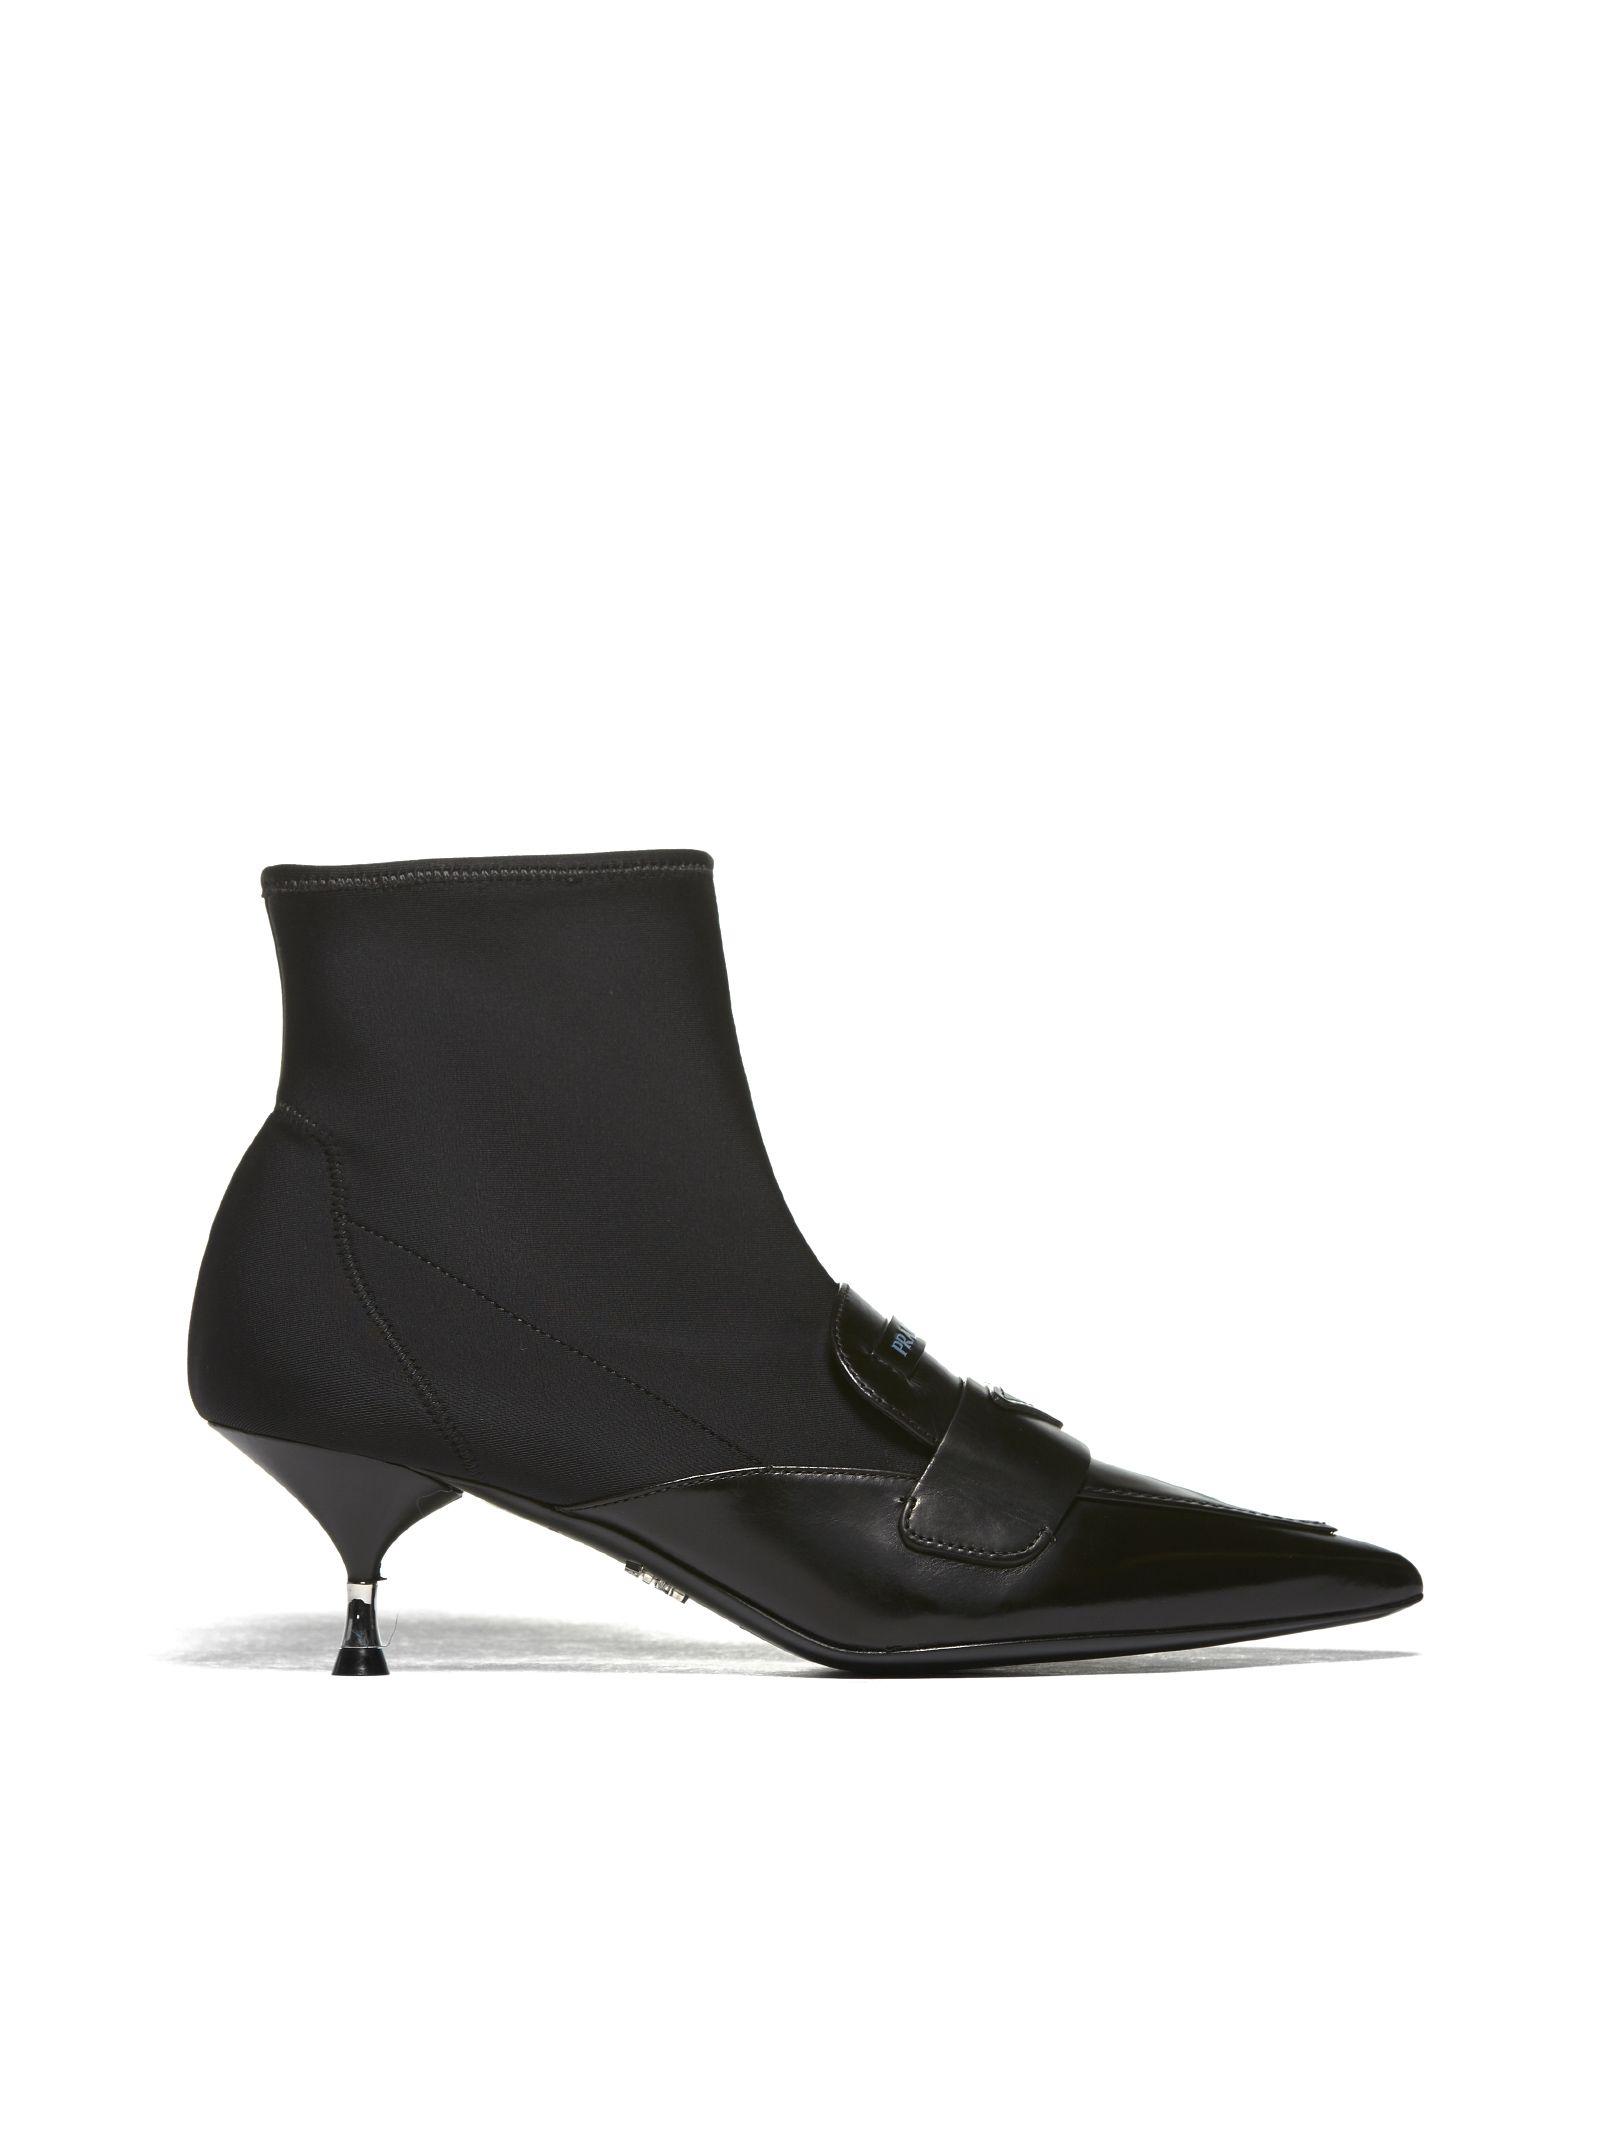 prada -  Kitten Heels Ankle Boots